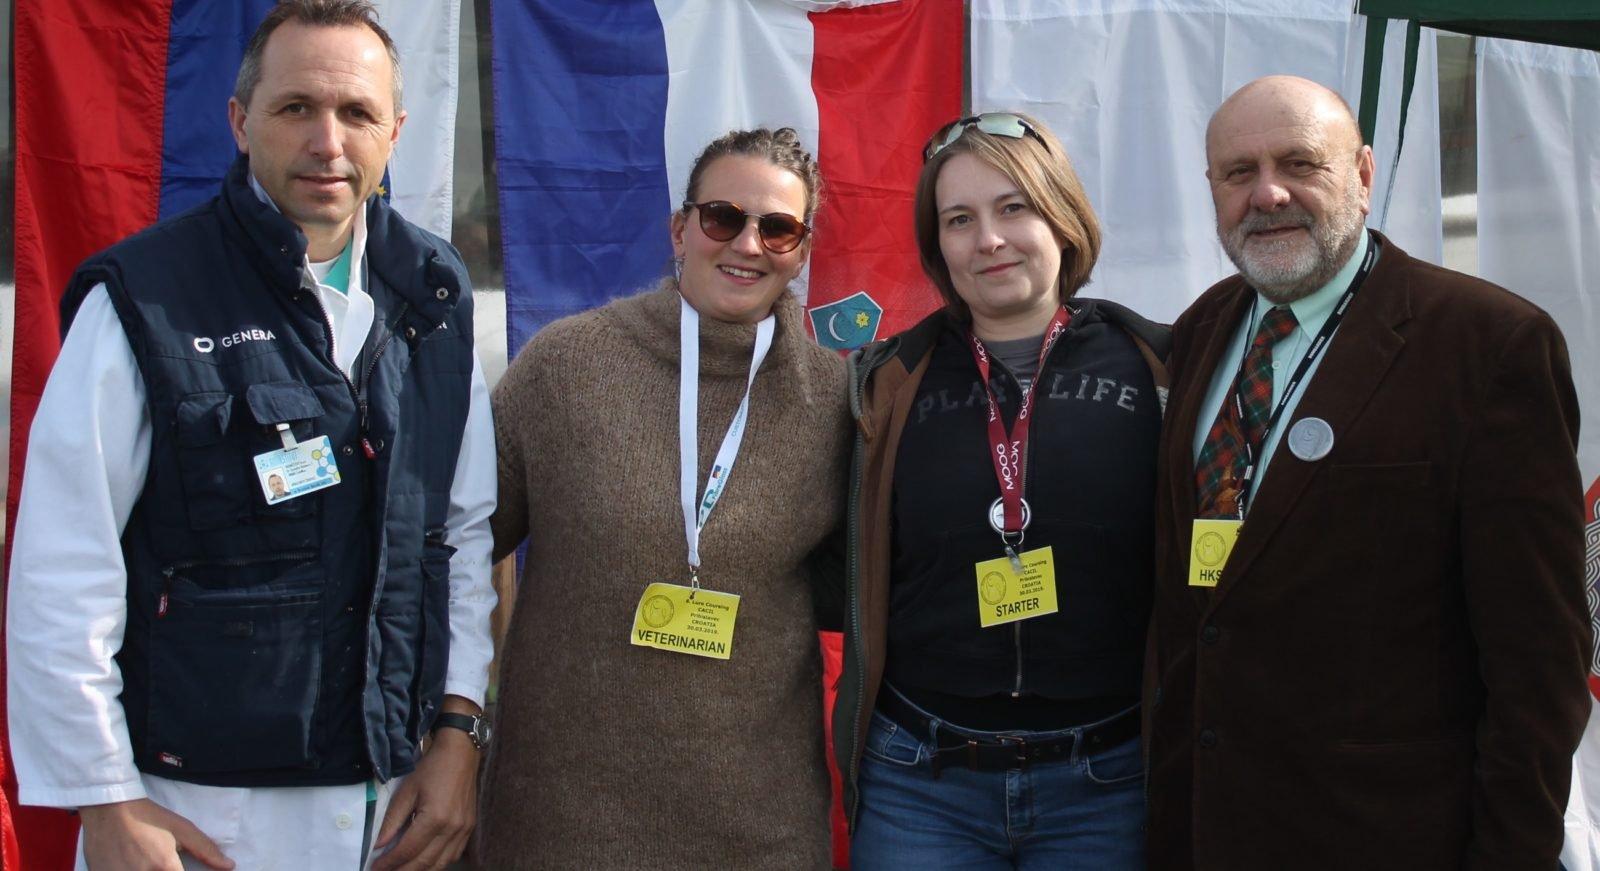 nadležni veterinar Branimir Novak, predsjednica Kluba Lea Slunjski, Tajnica Kluba Sonja Mjher i delegat kinološkog saveza Dražen Kipke